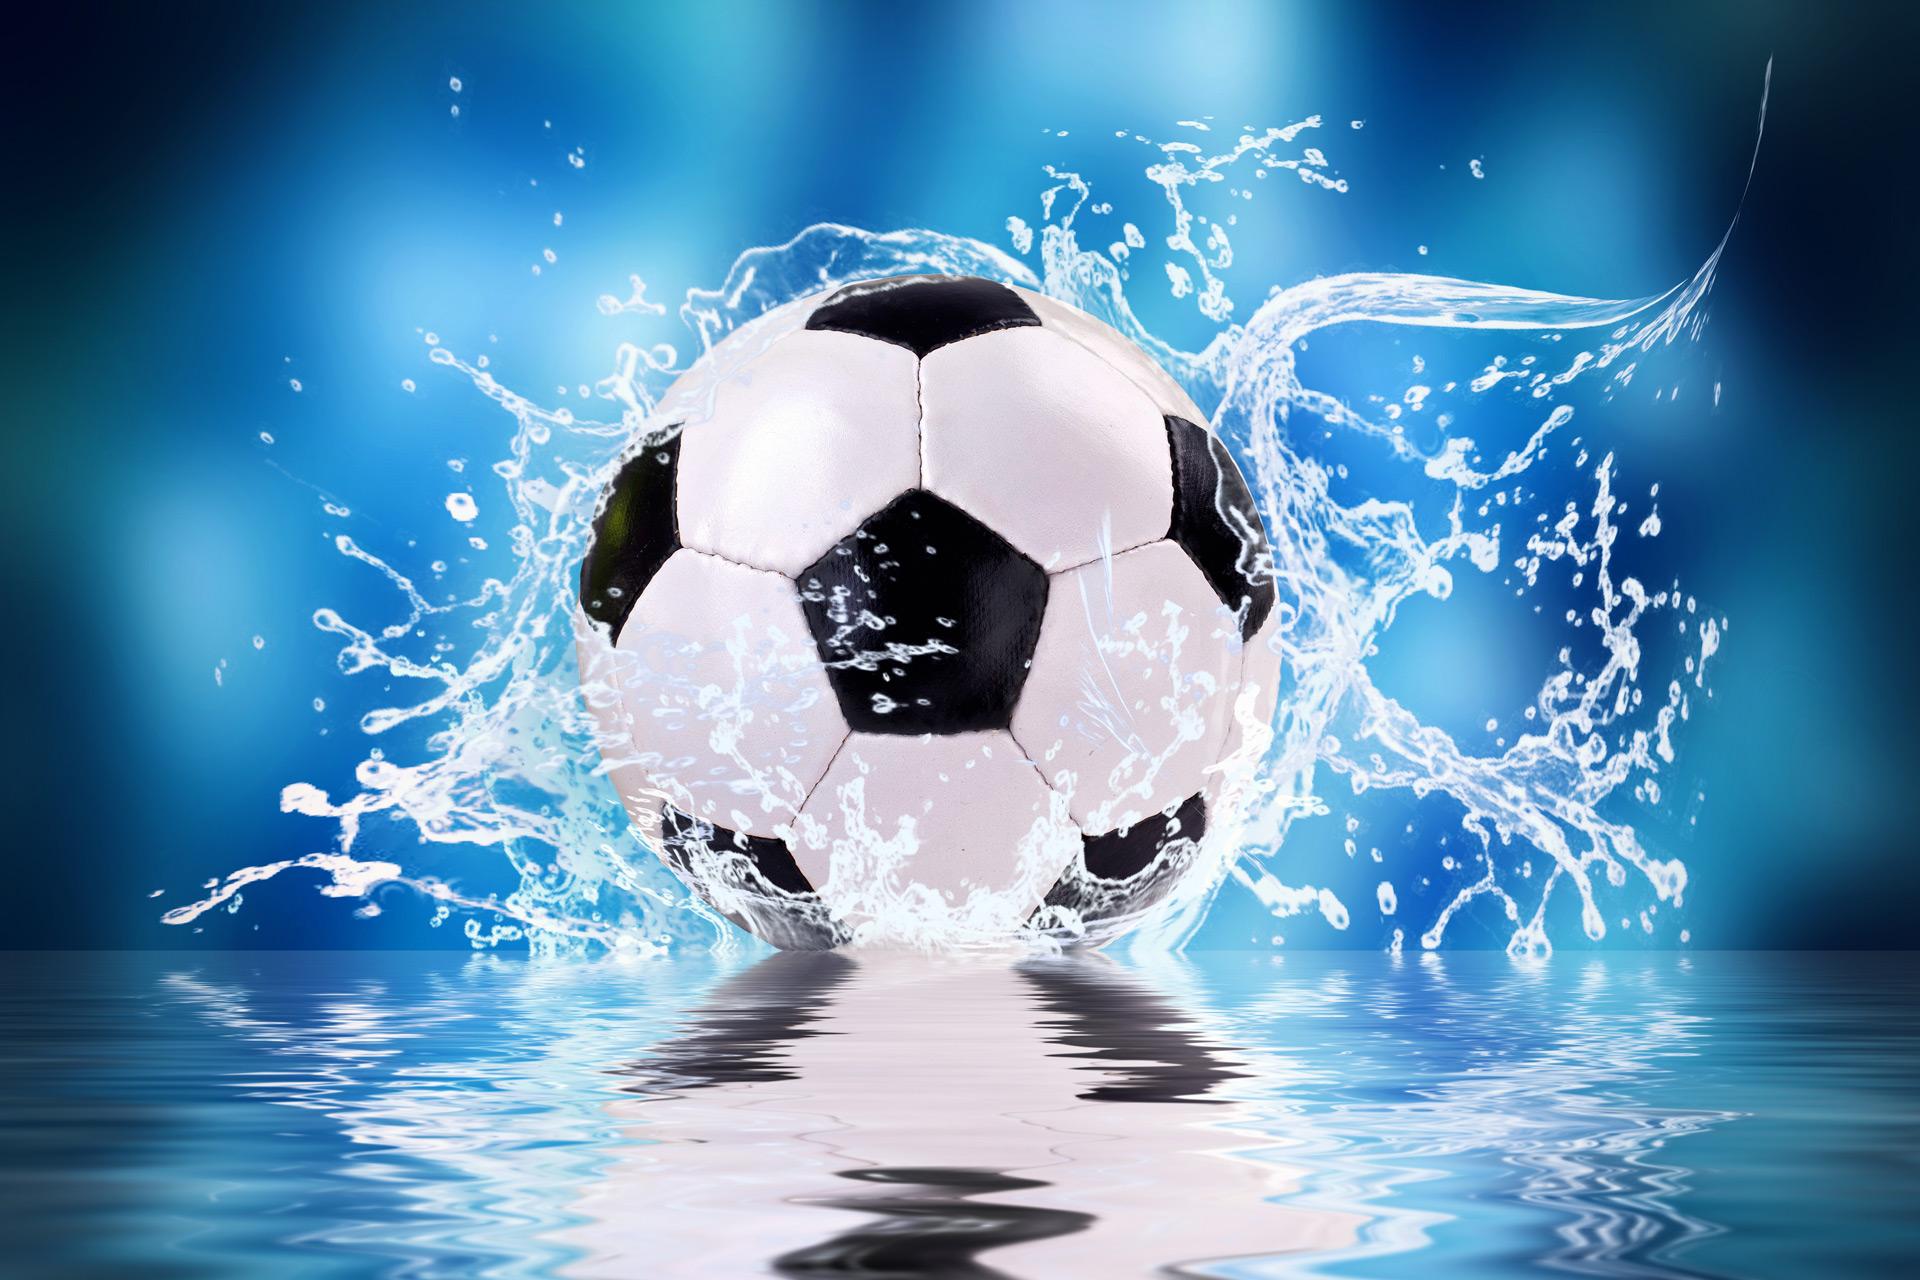 Fussball rollt durch Wasser